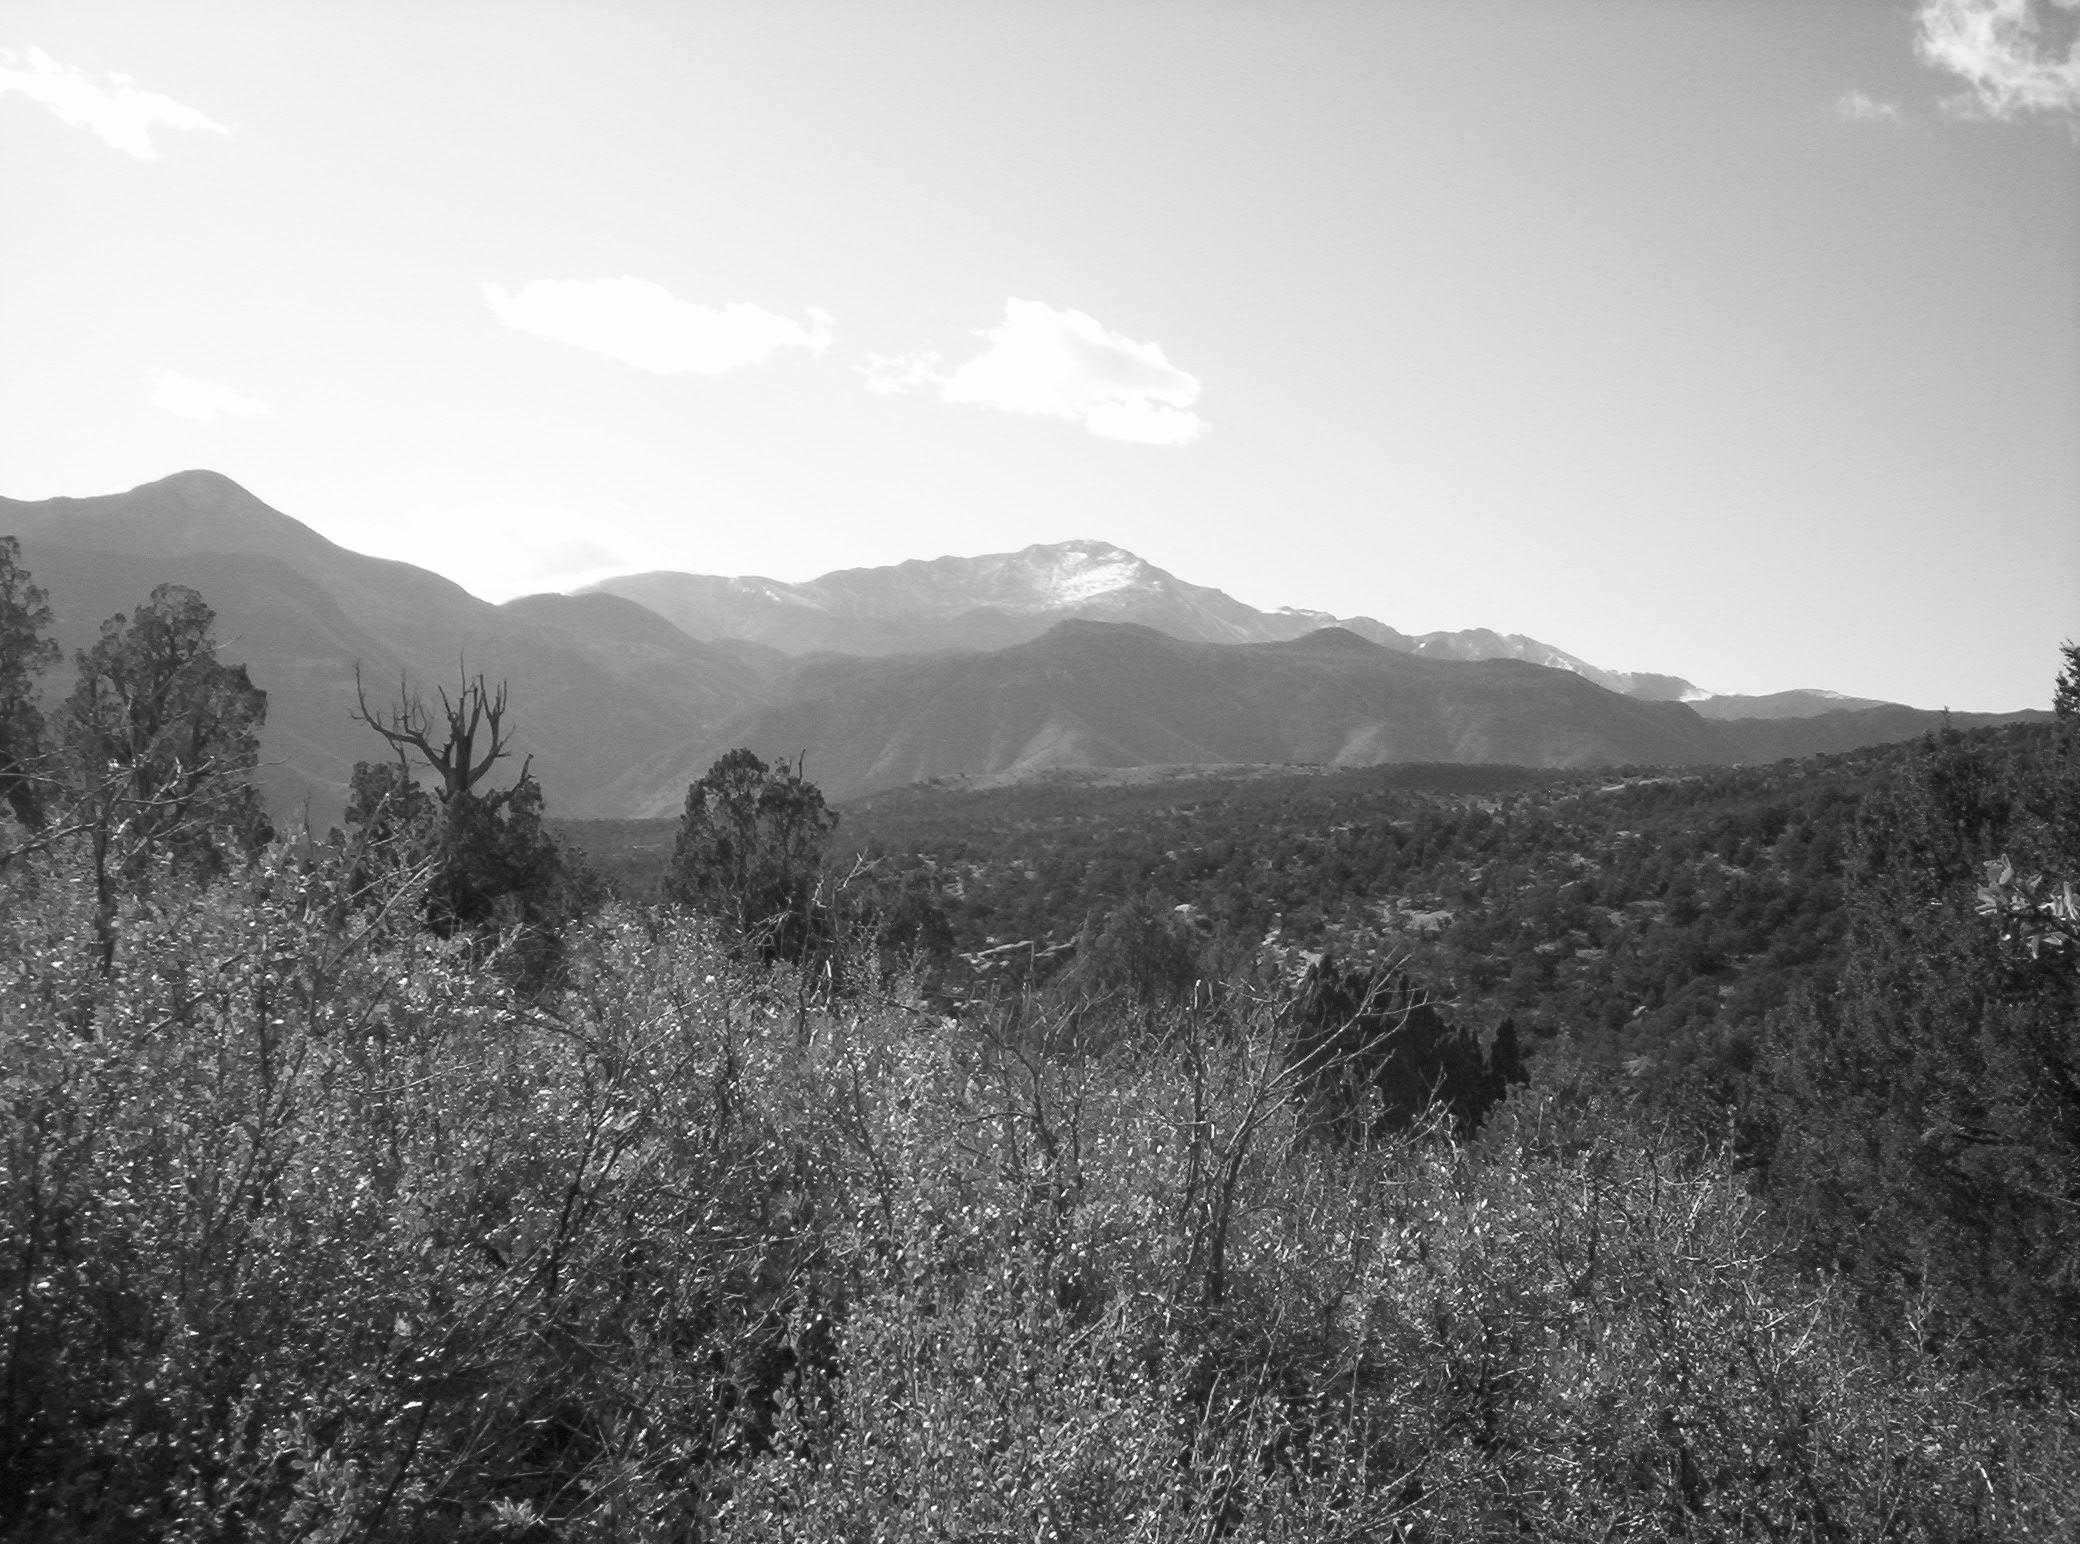 Buena Vista - Copyright ©2008 David M. Bandler, All Rights Reserved.